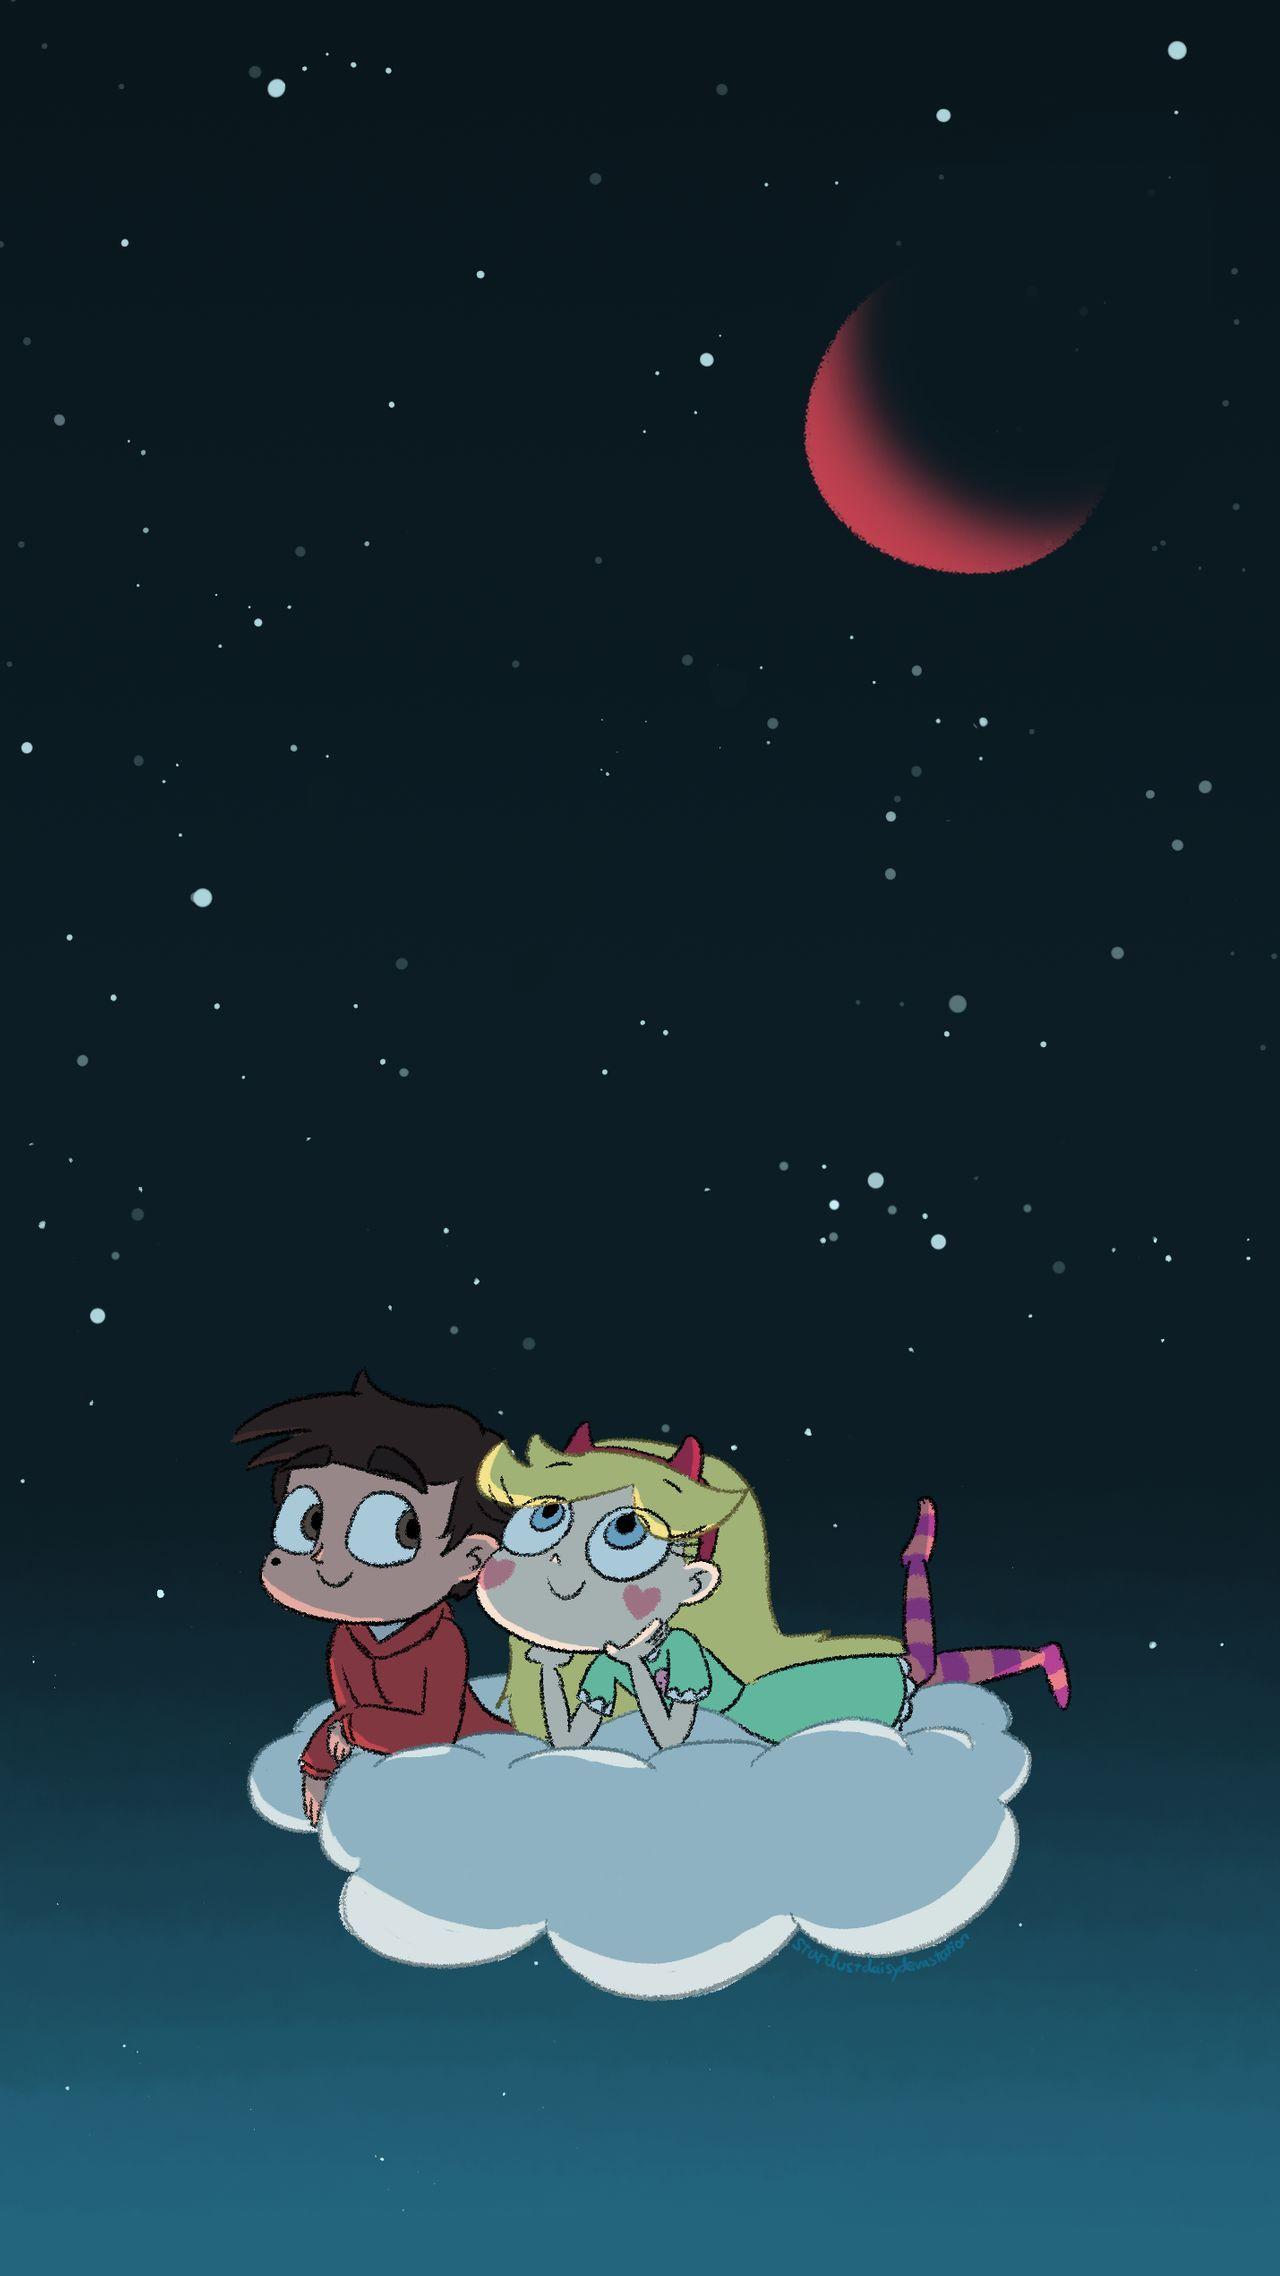 Stargazing by stardustdaisy on DeviantArt